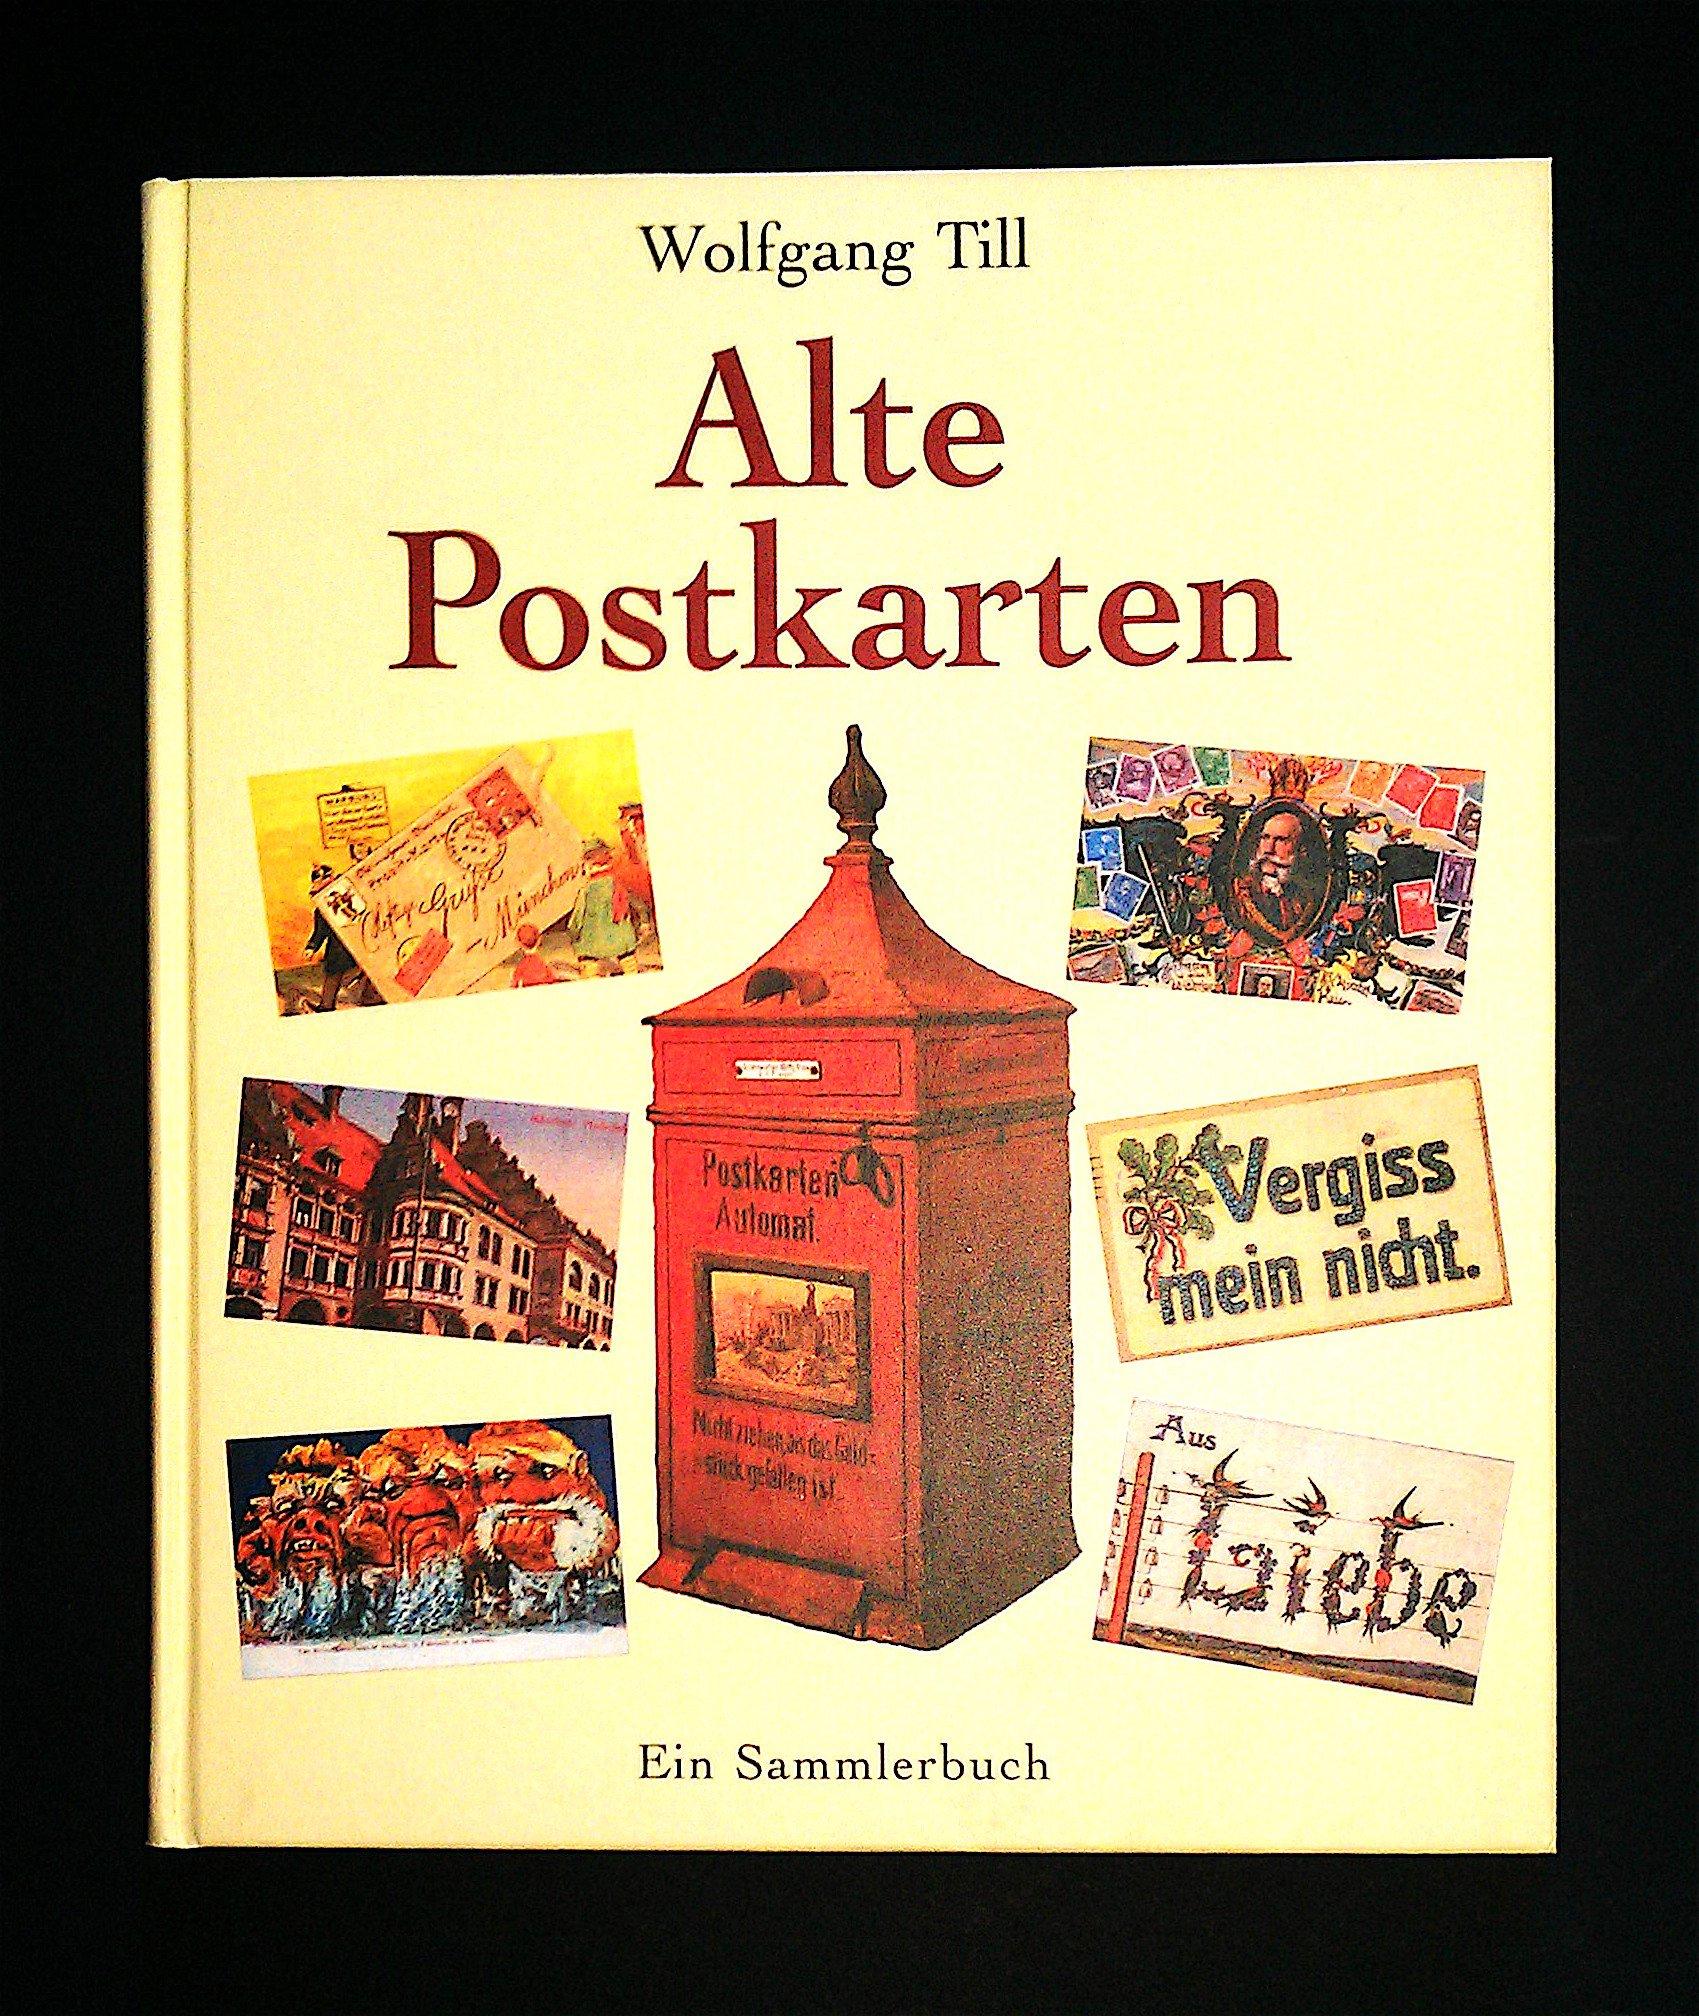 Alte Postkarten. Ein Sammlerbuch. Gebundenes Buch – 2003 Wolfgang Till Weltbild 3828907938 MAK_new_usd__9783828907935